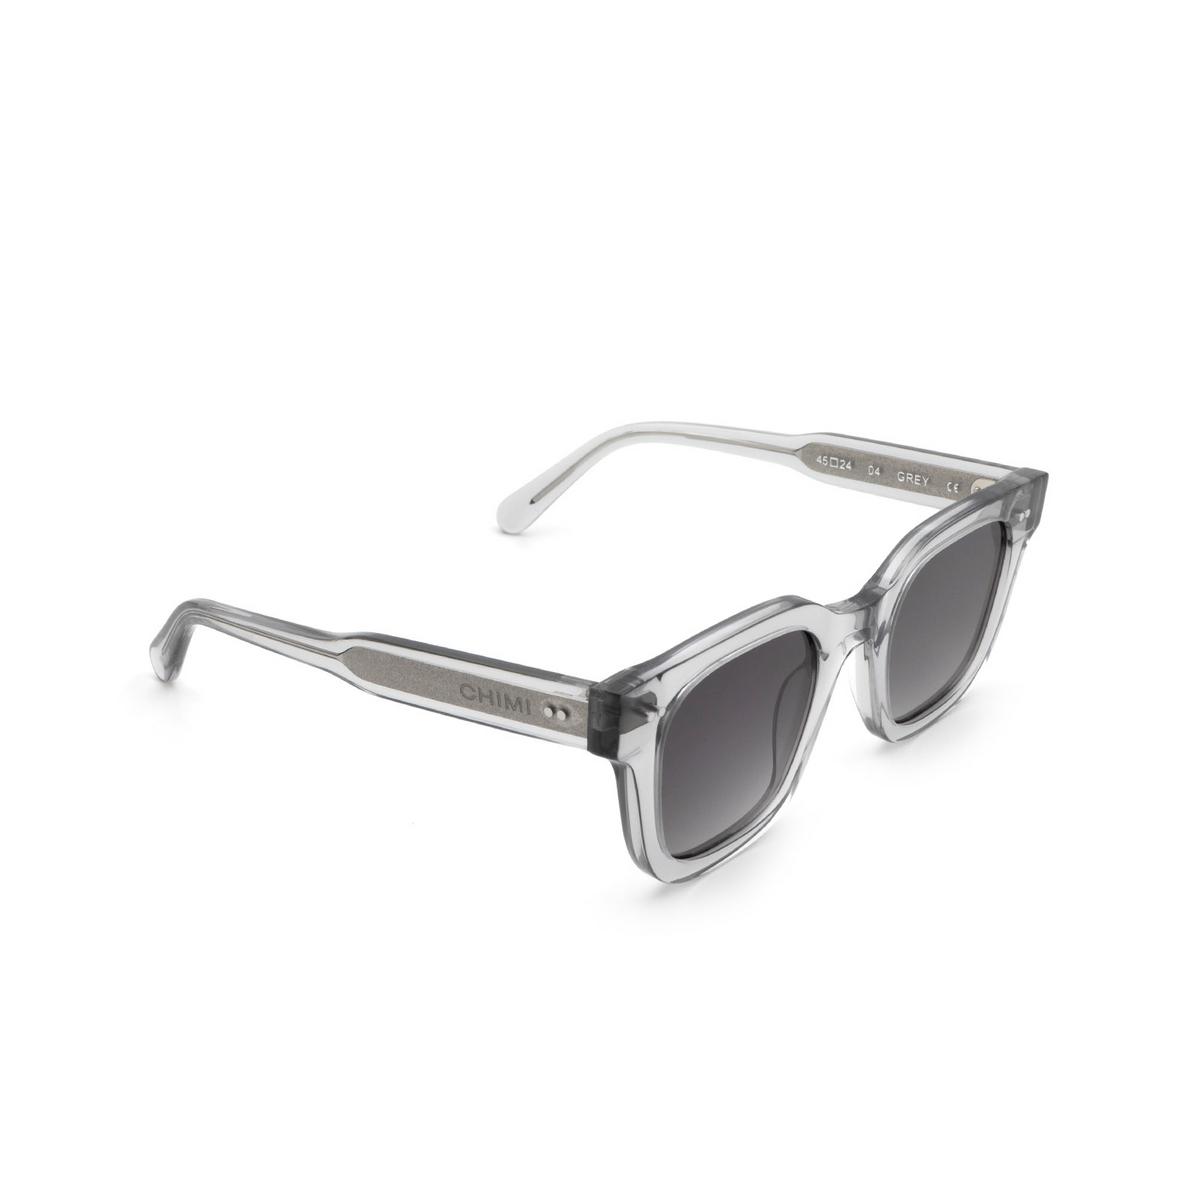 Chimi® Square Sunglasses: 04 color Grey - three-quarters view.